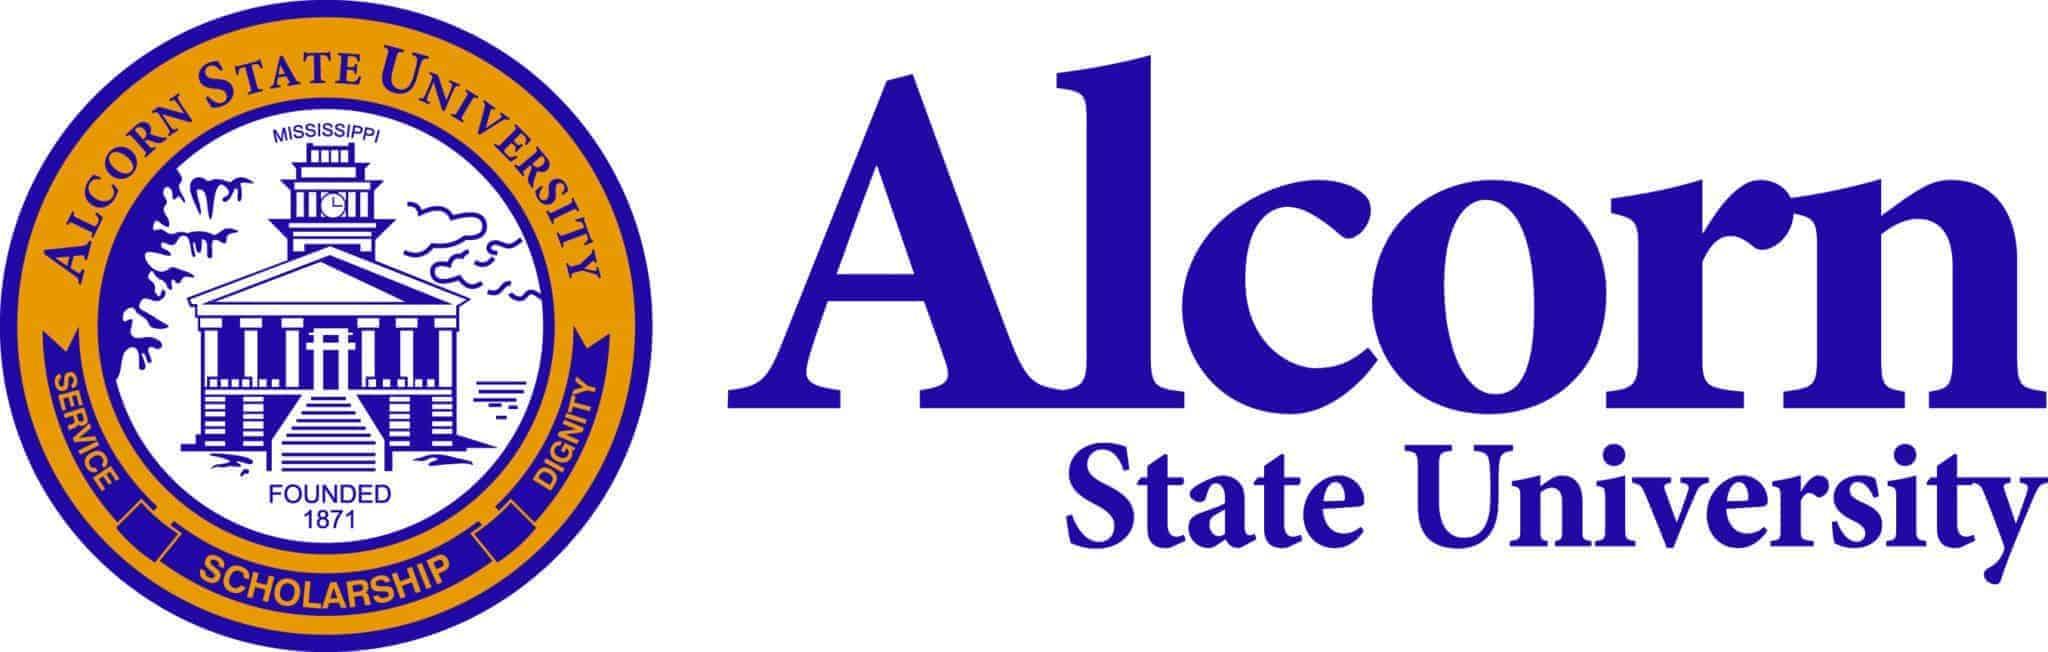 office of academic technologies alcorn state university logo 129672